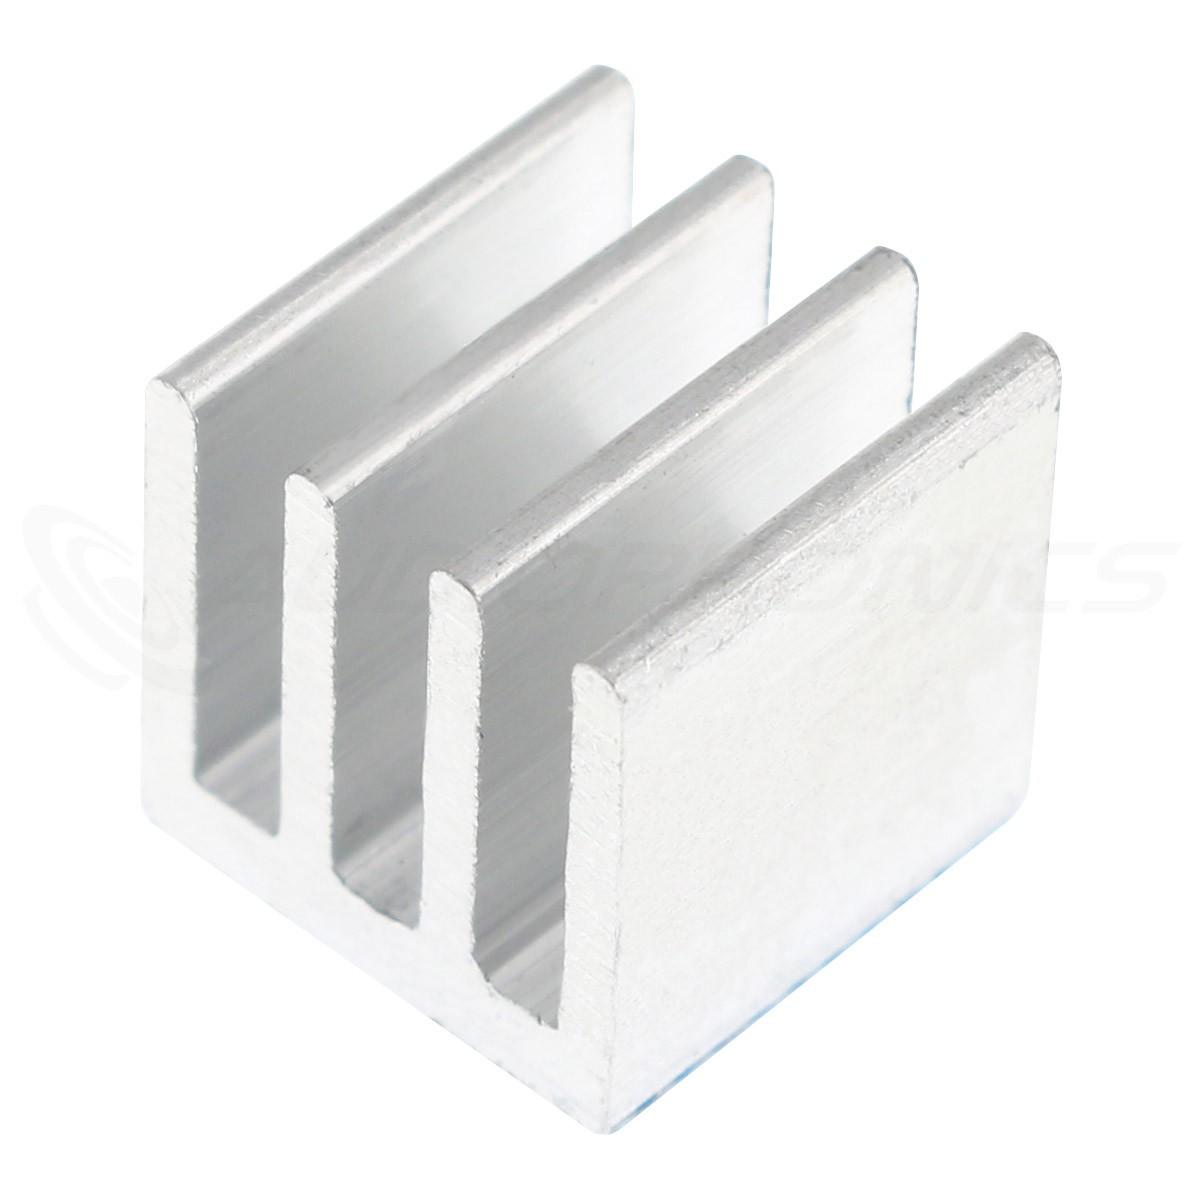 Aluminium Adhesive Heatsink Radiator 10x10x10mm Silver